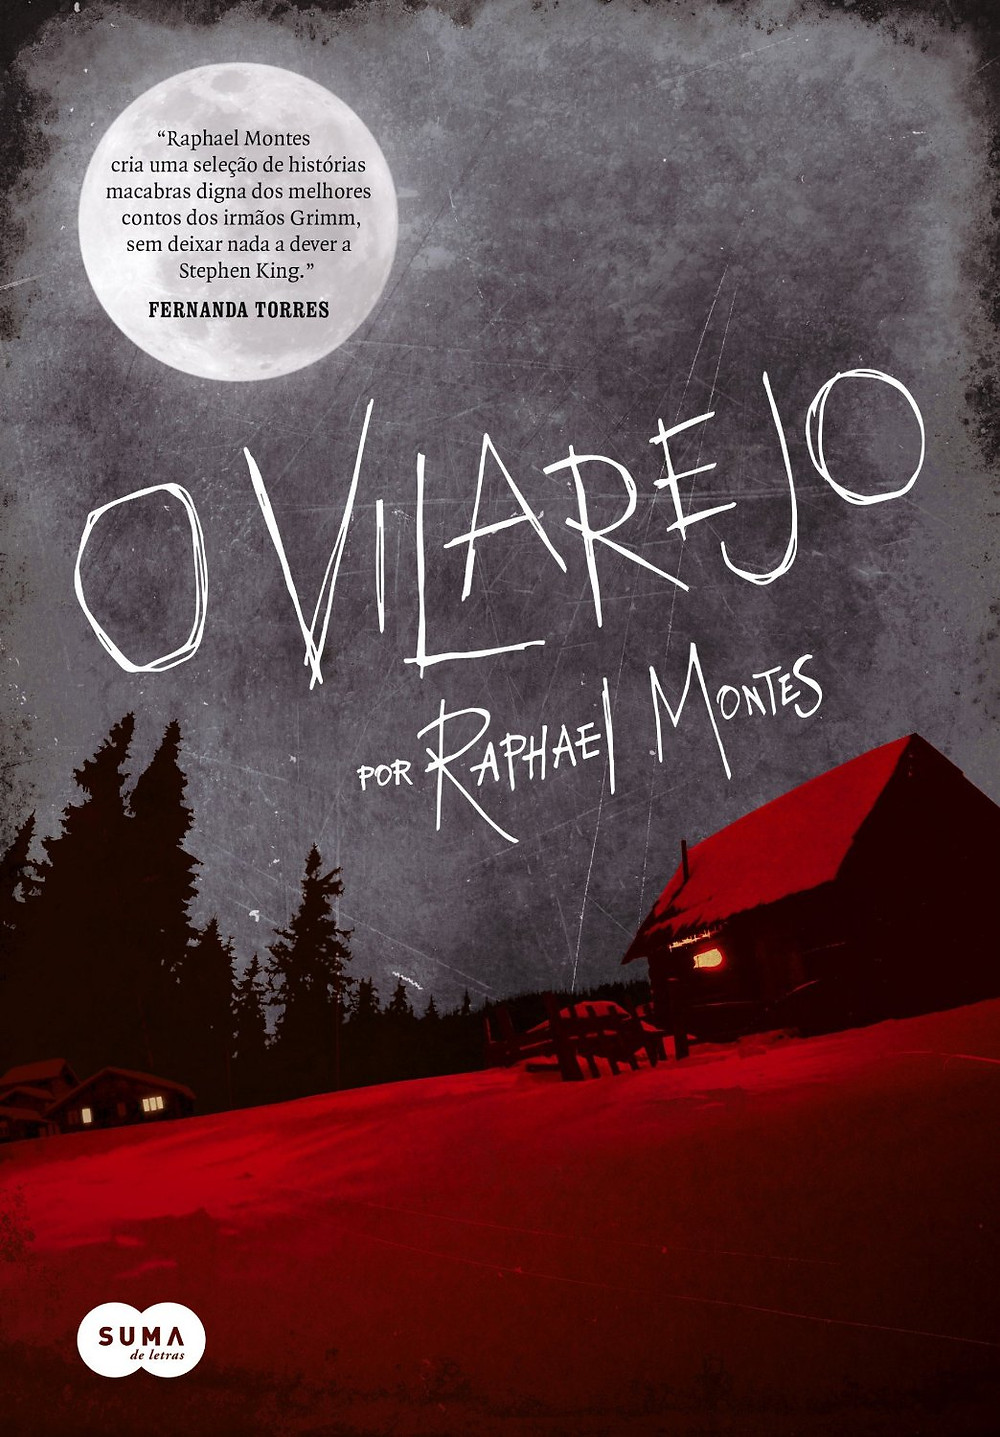 O Vilarejo de Raphael Montes